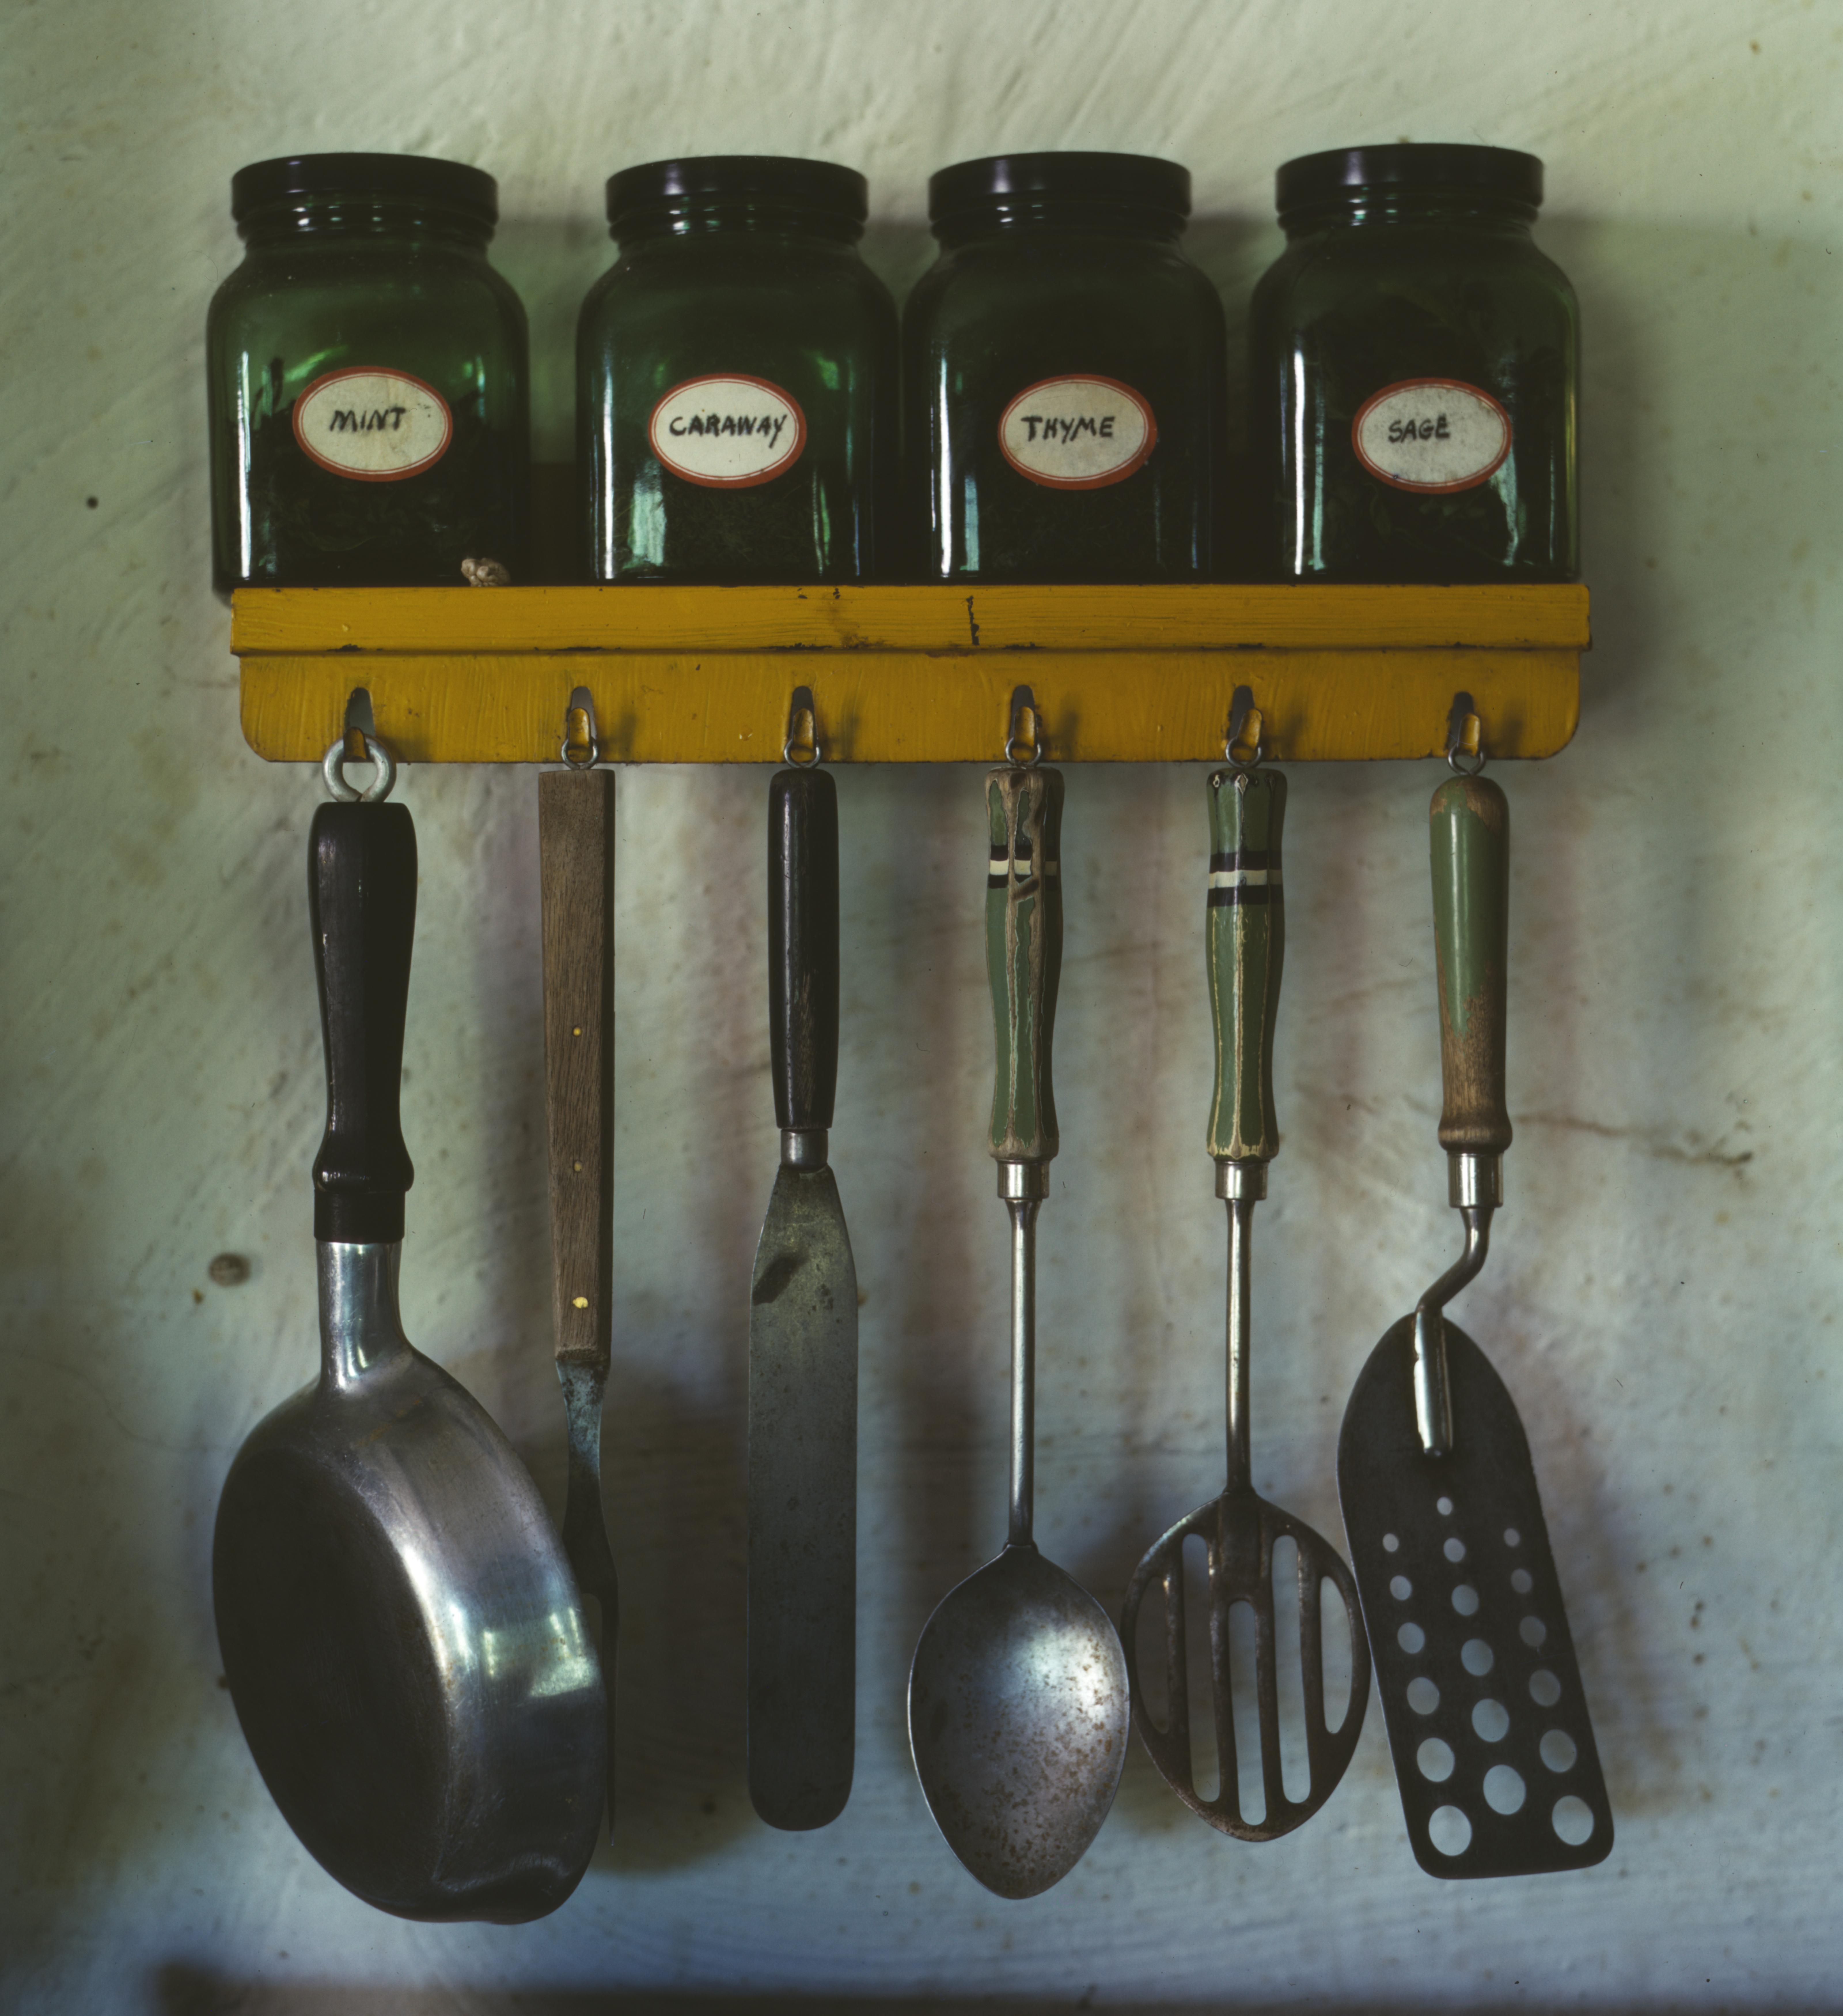 Hanging utensil rack for kitchen - File Kitchen Utensils Hanging Below A Spice Rack Jpg